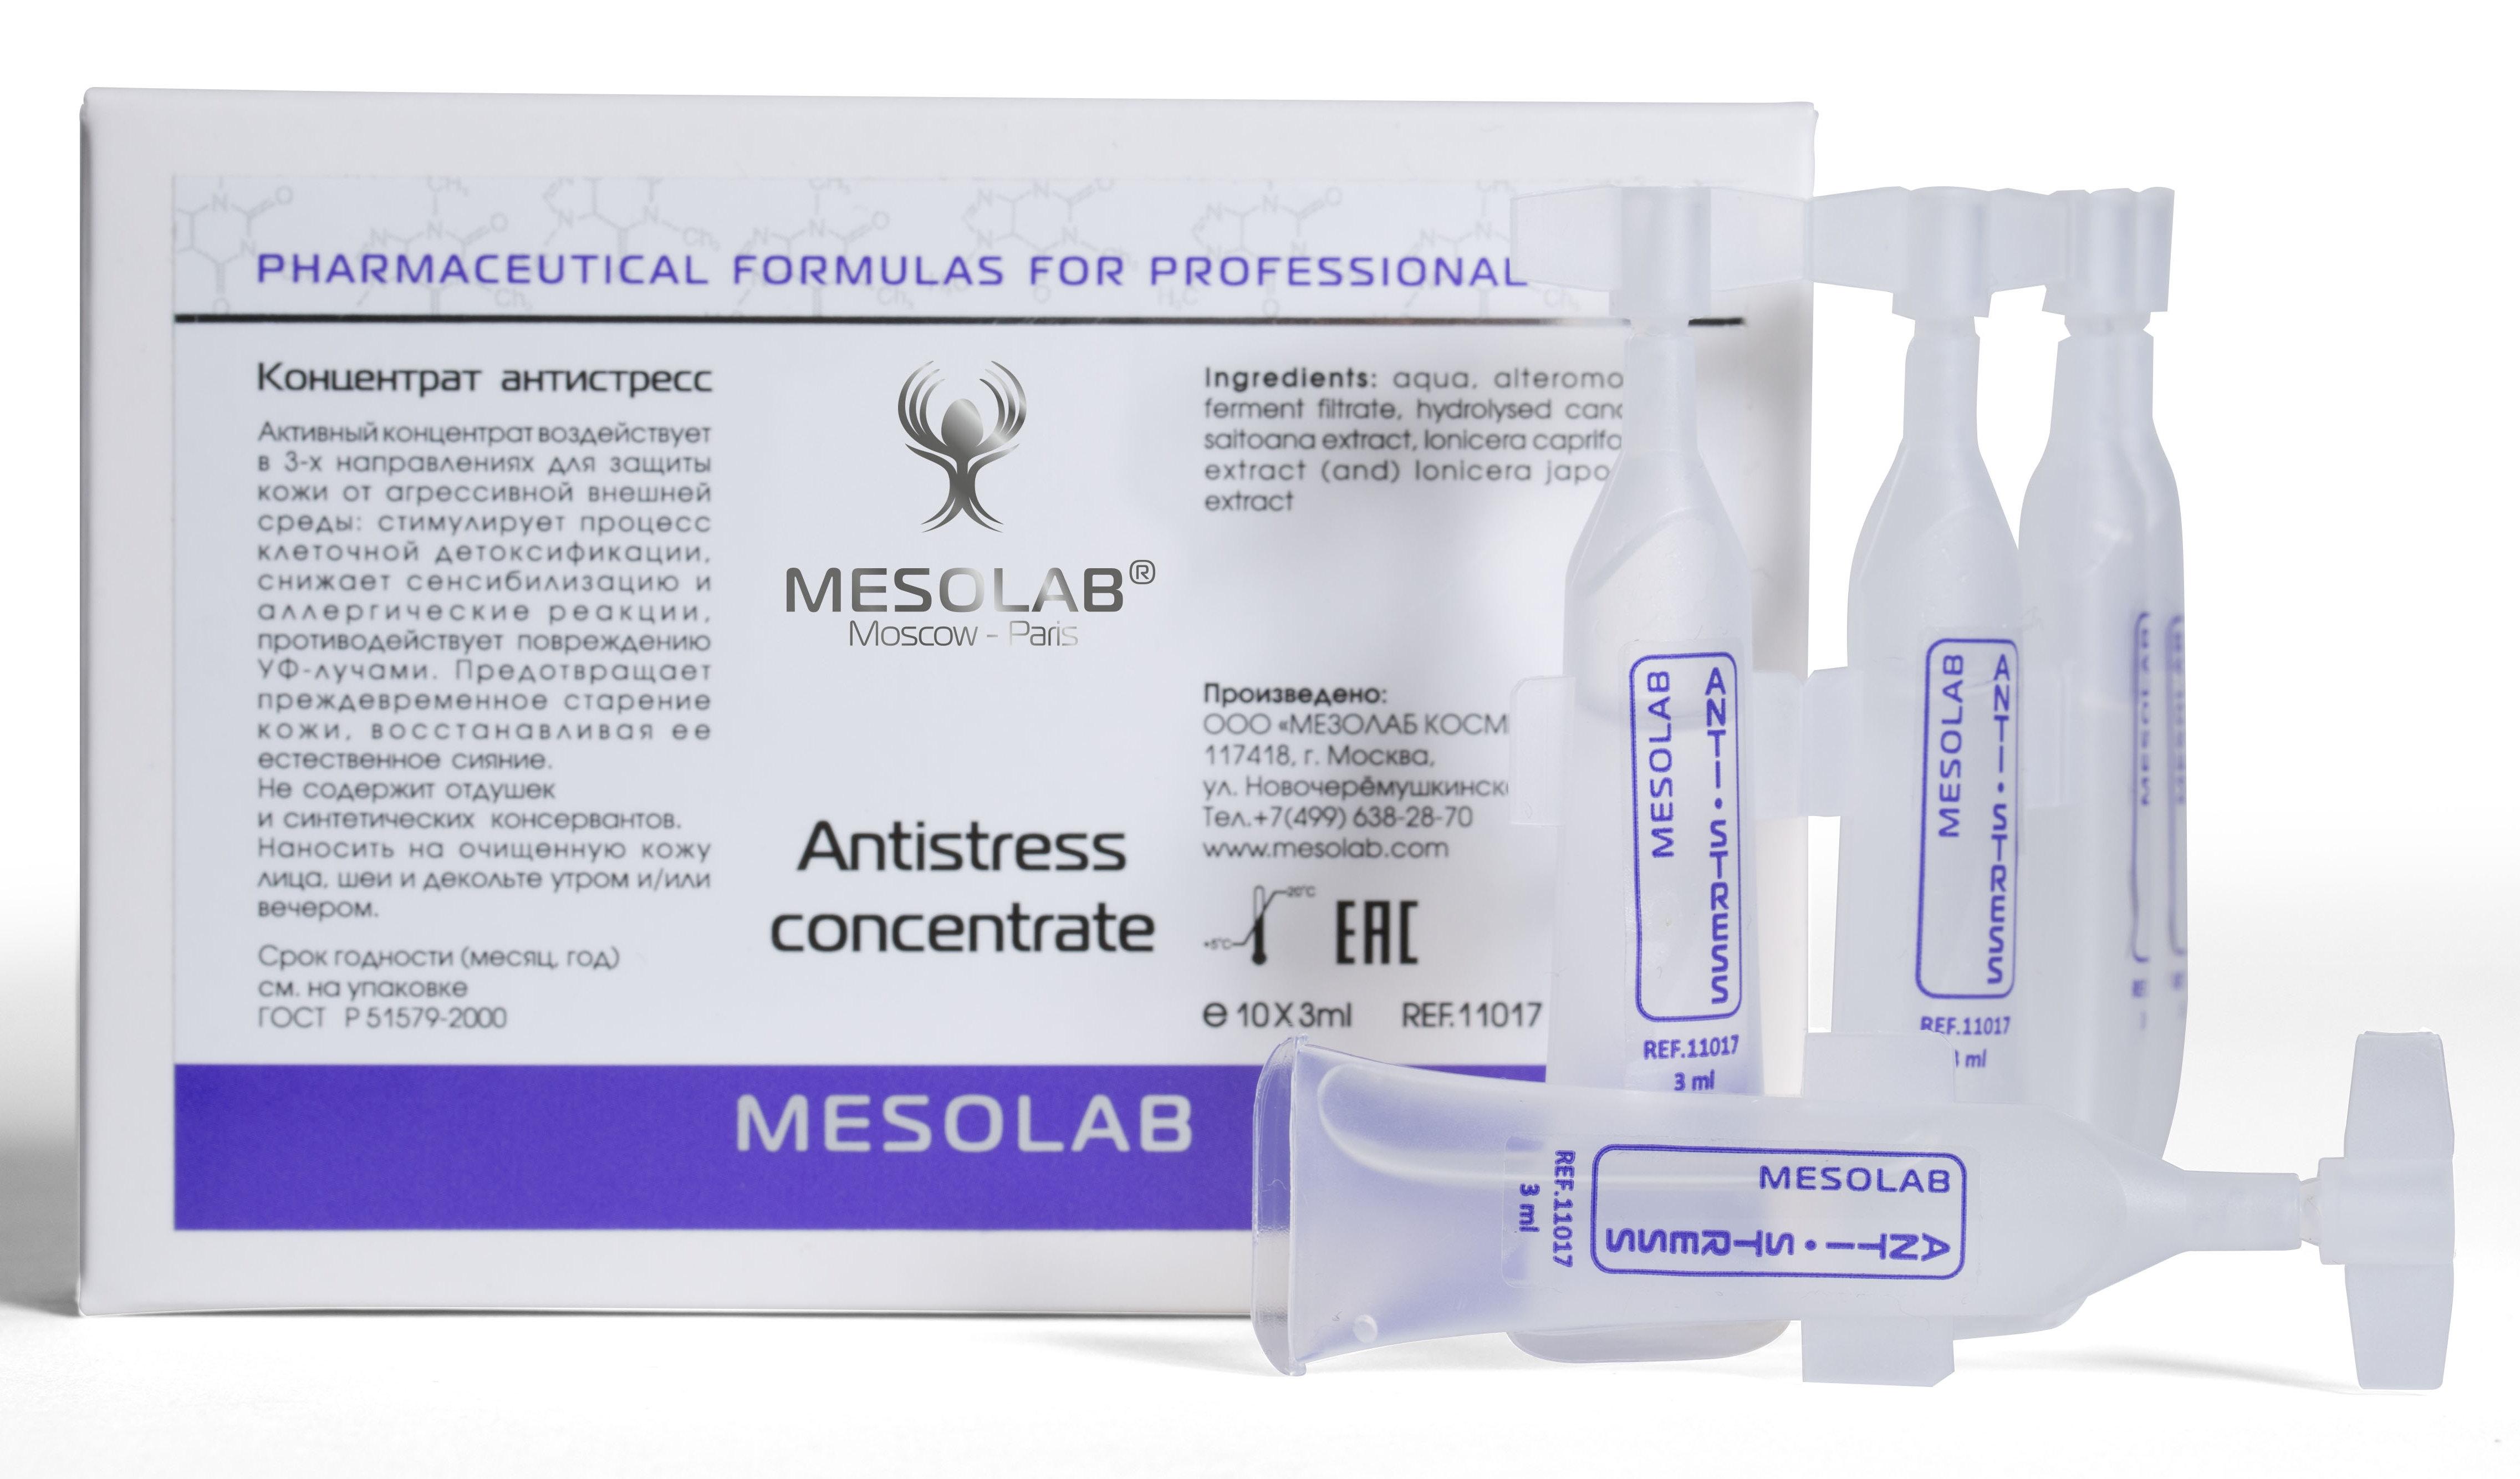 MESOLAB Концентрат антистресс / ANTISTRESS CONCENTRATE 10*3 мл